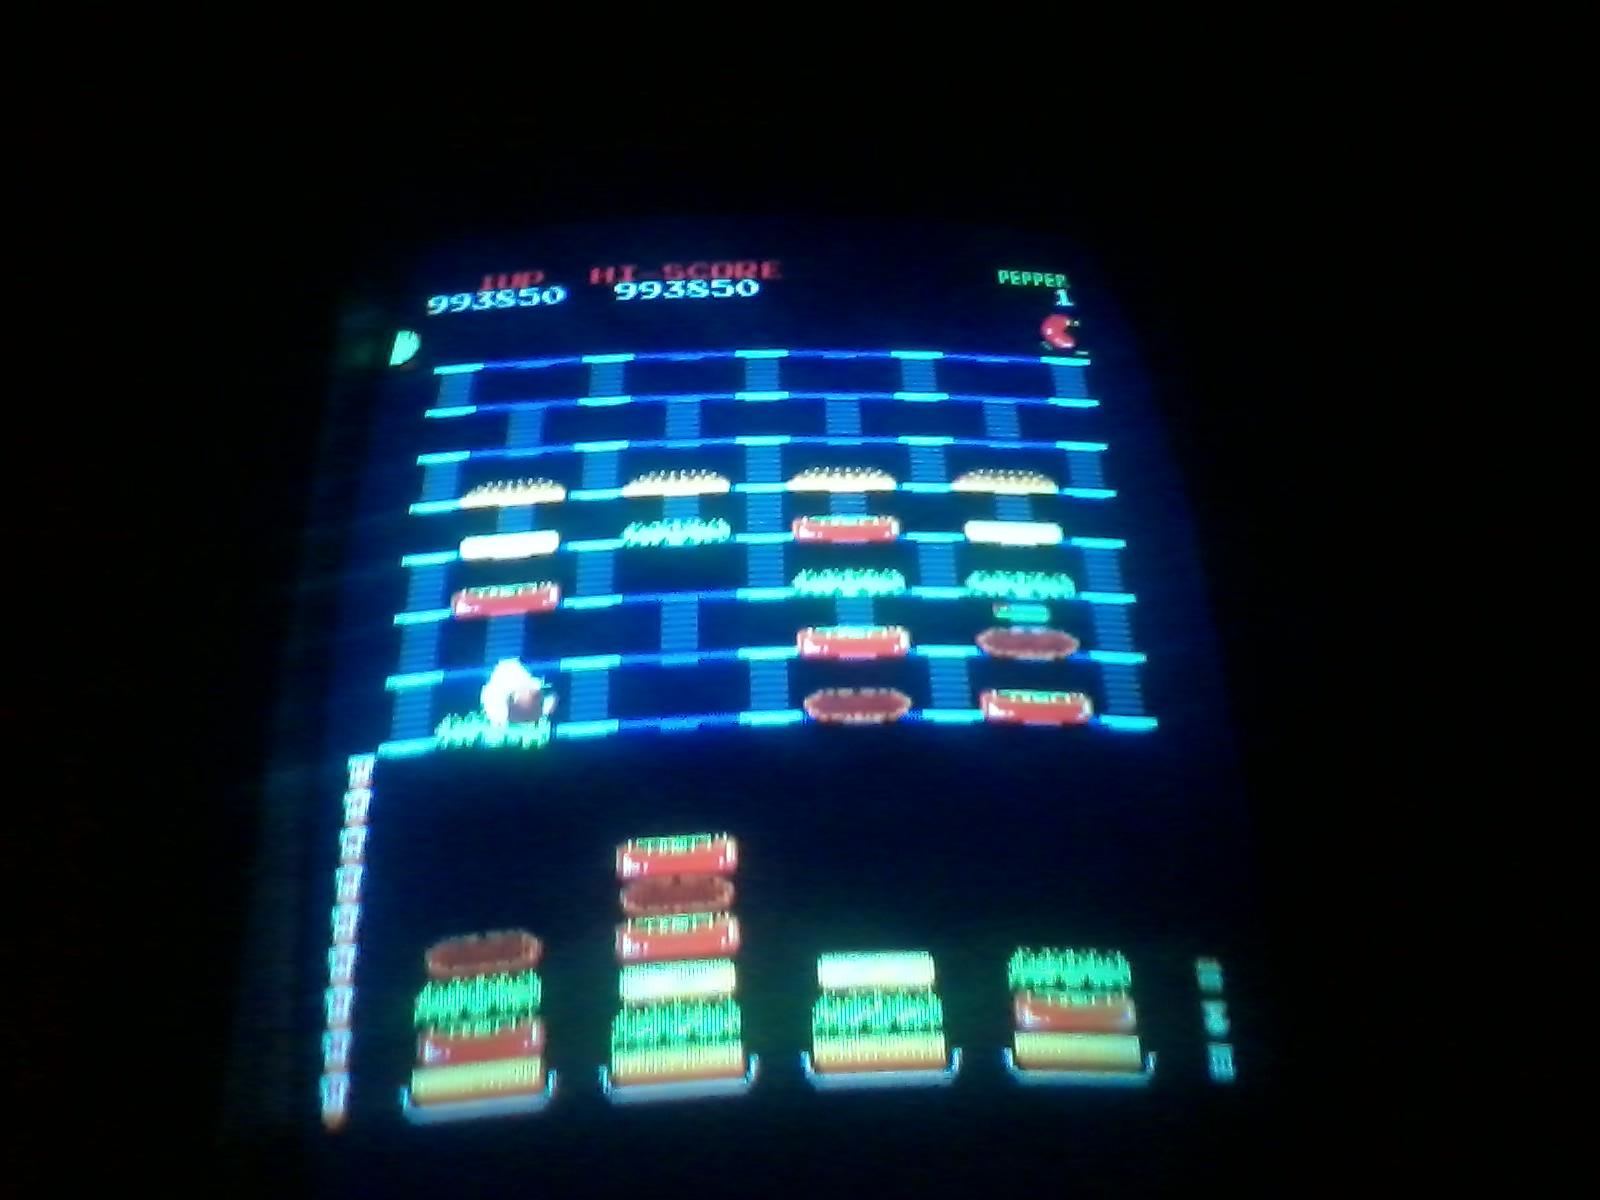 BurgerTime 993,850 points